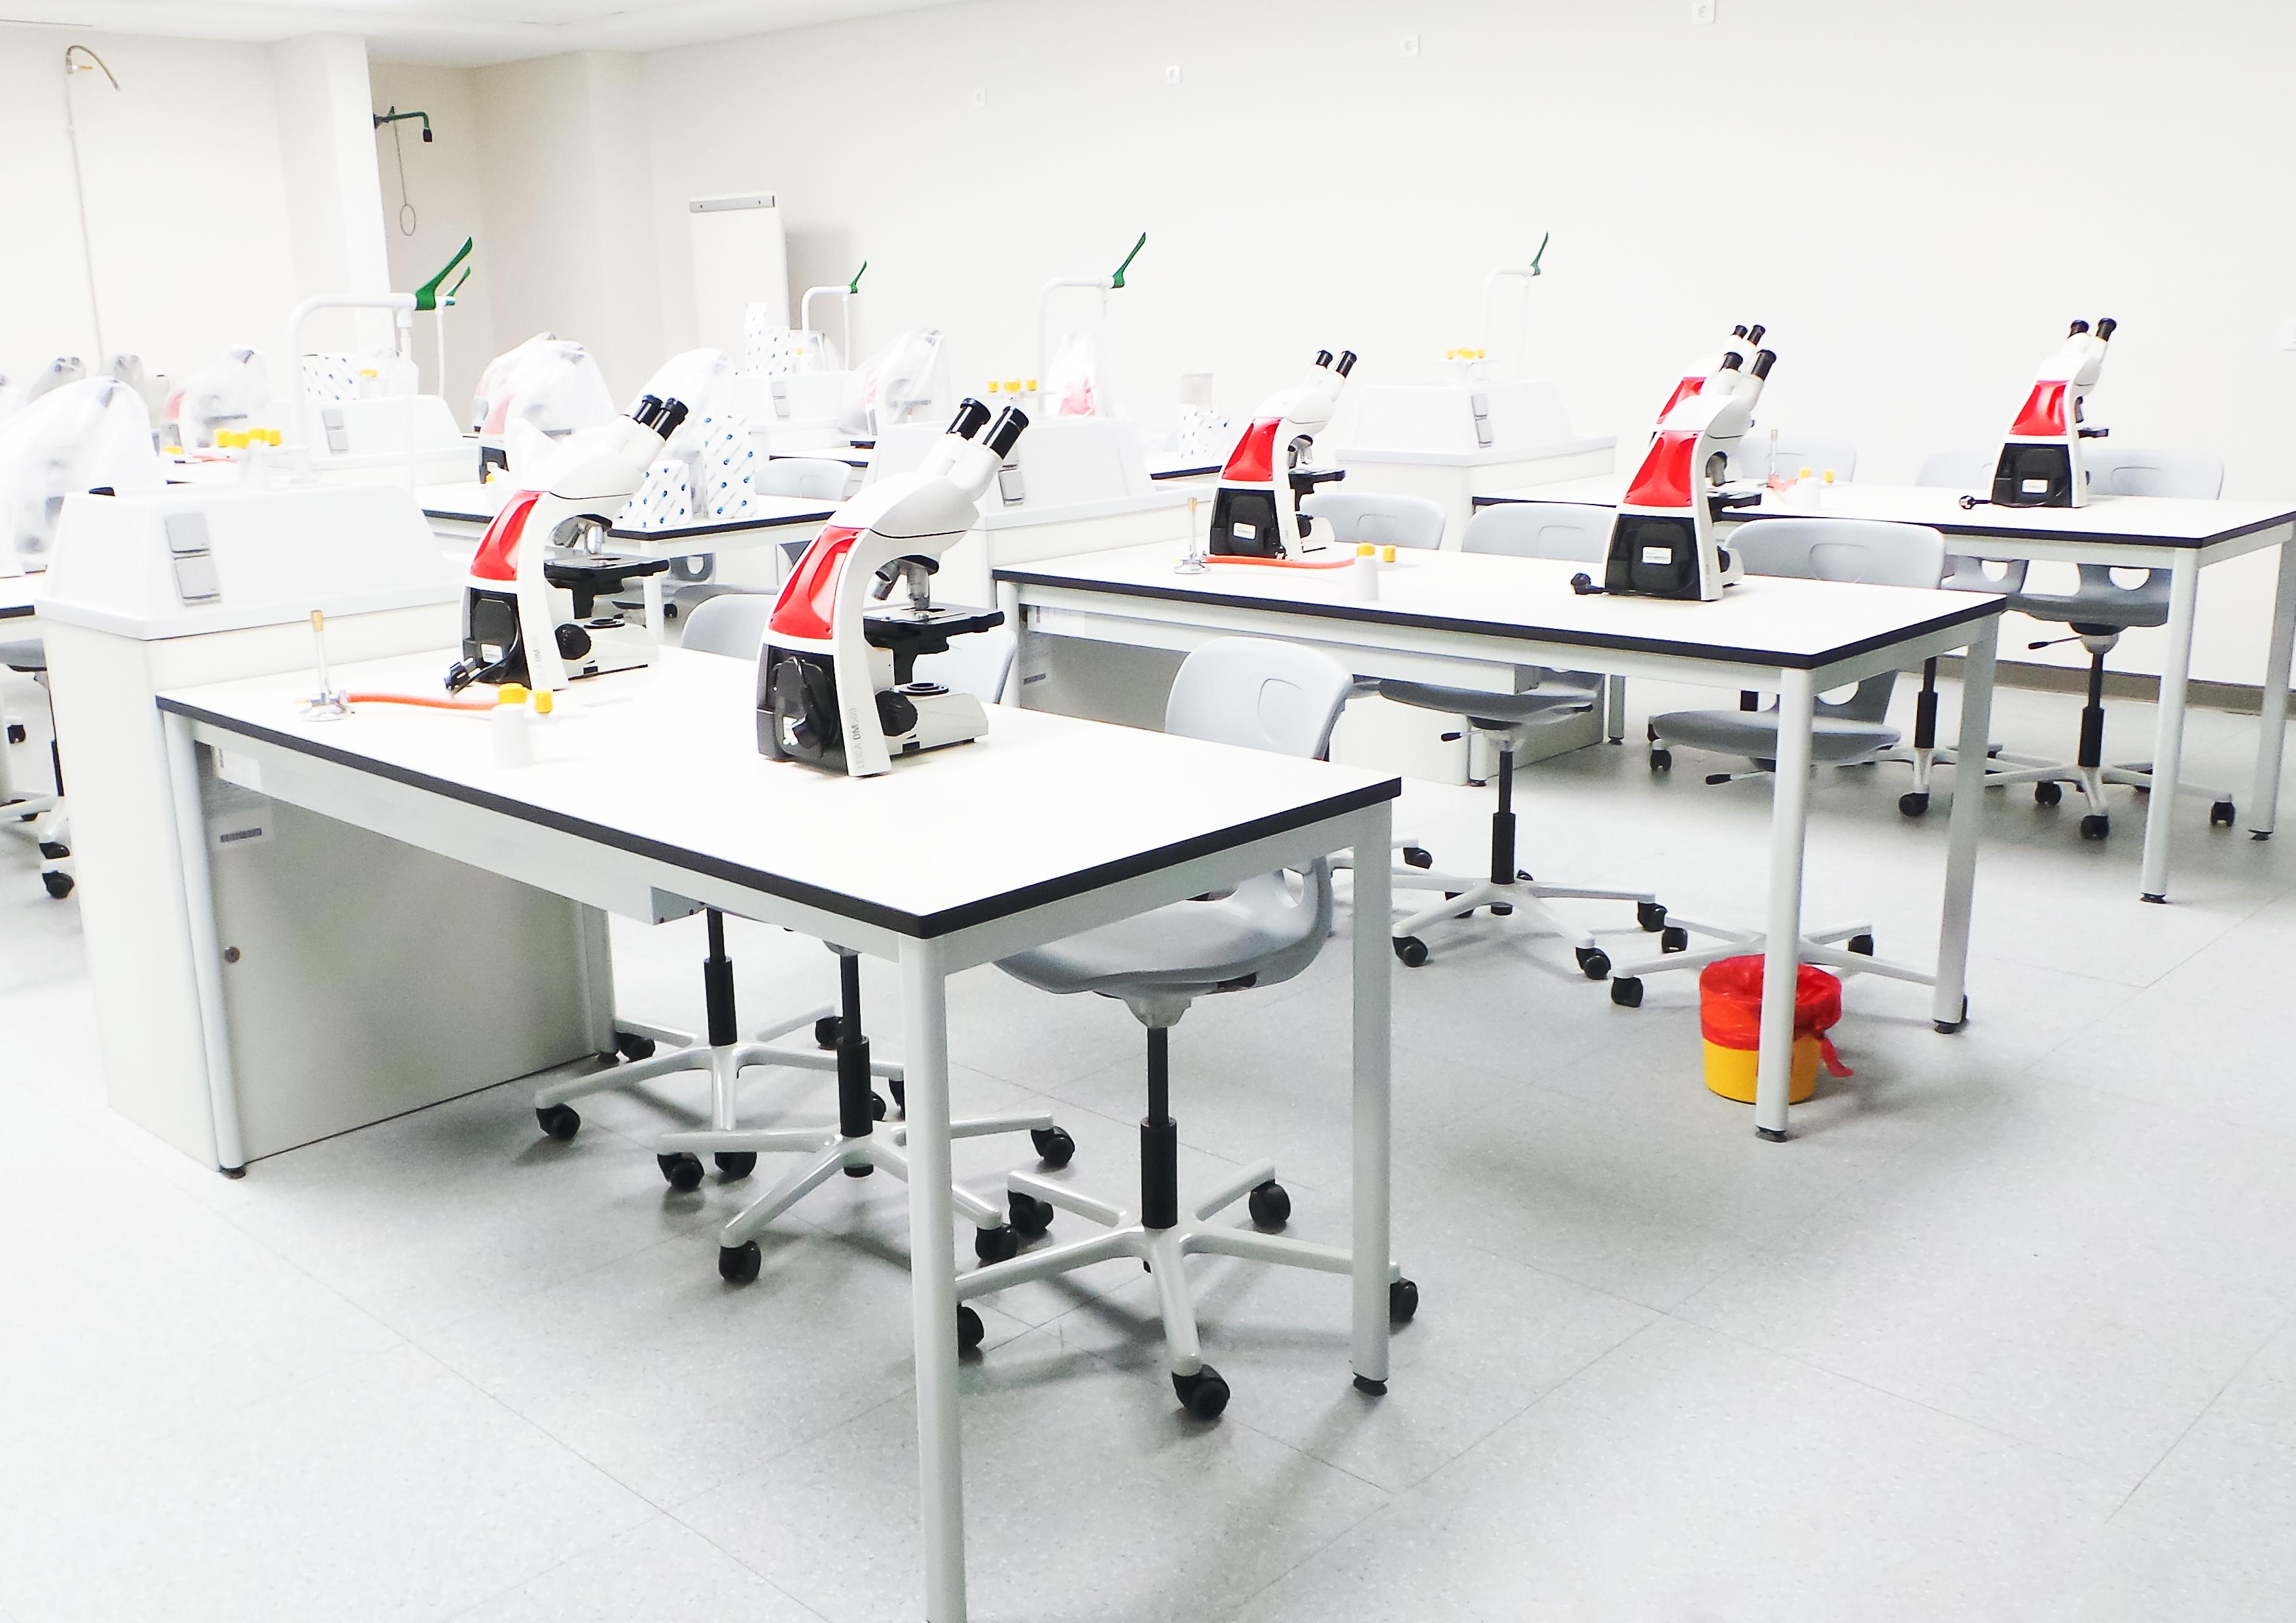 Laboratory system solution